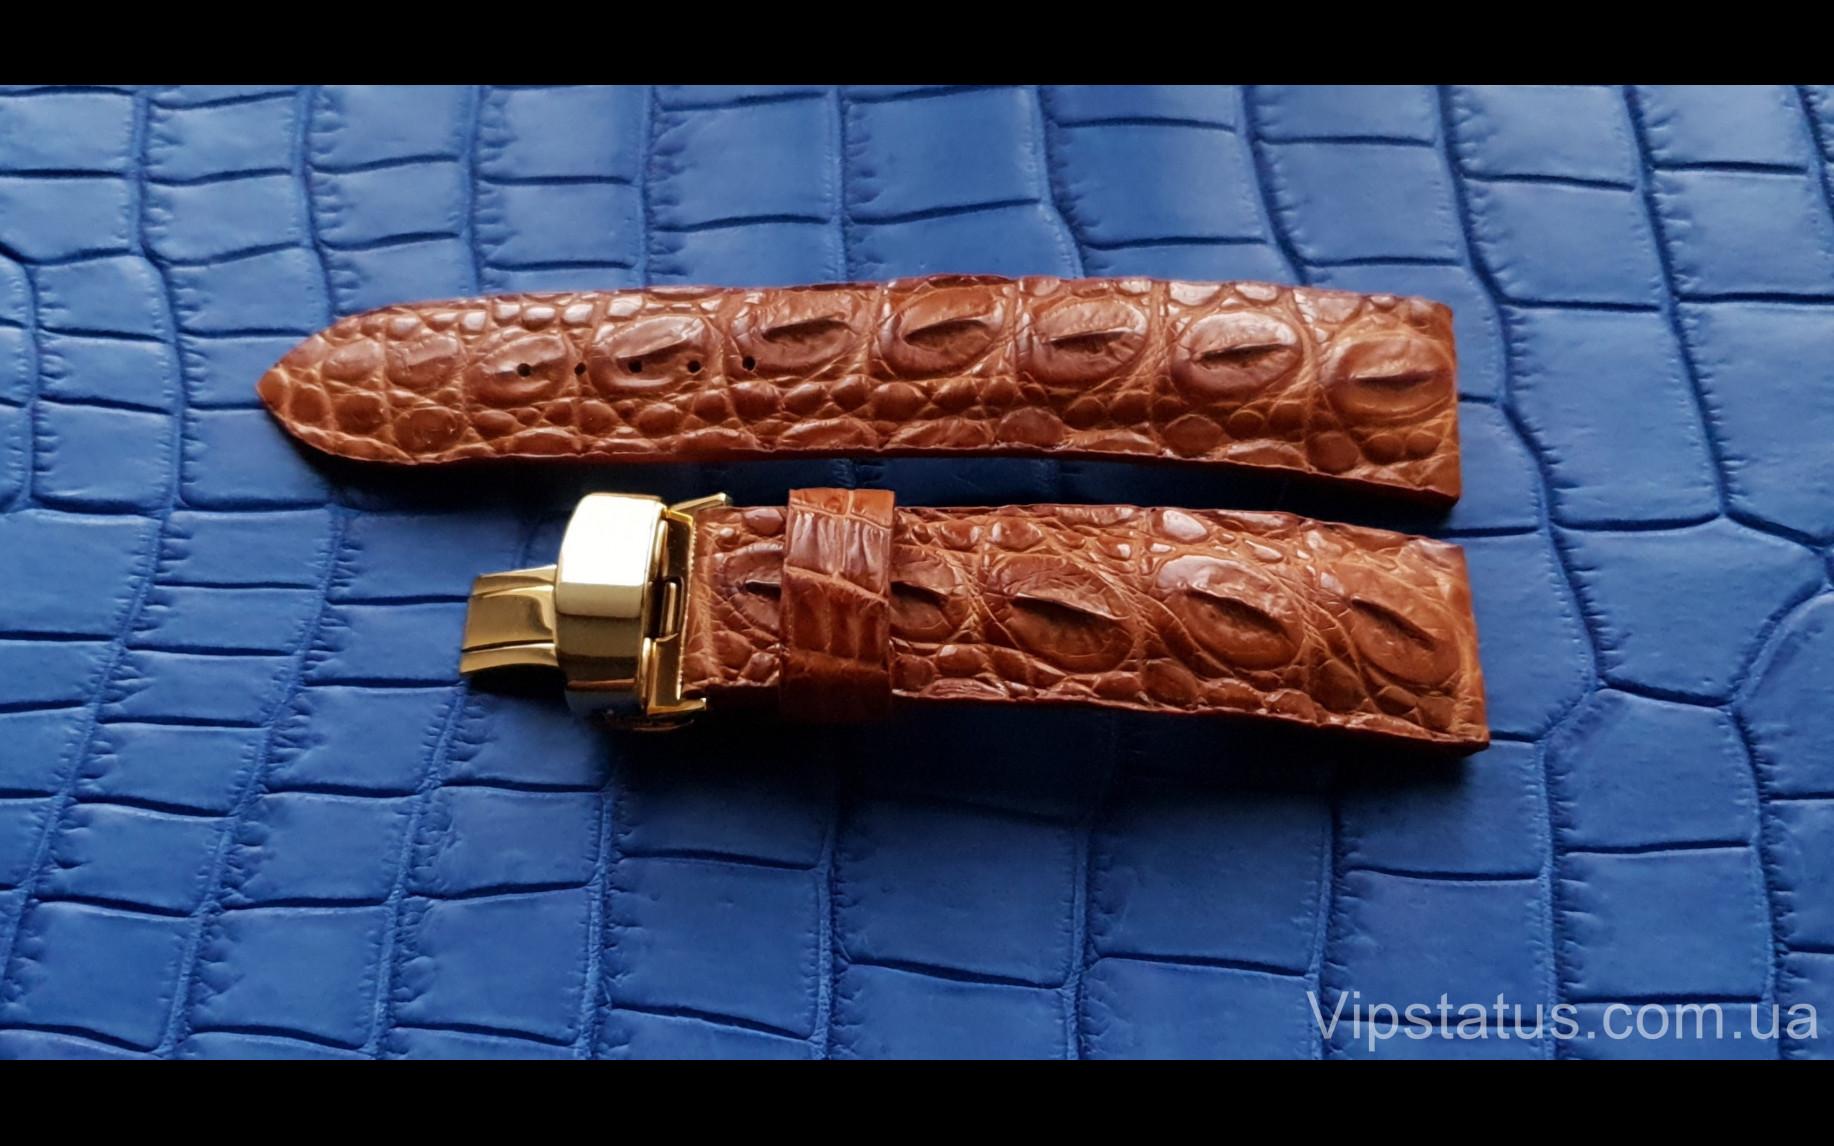 Elite Брутальный ремешок для часов Montblanc кожа крокодила Brutal Crocodile Strap for Montblanc watches image 2